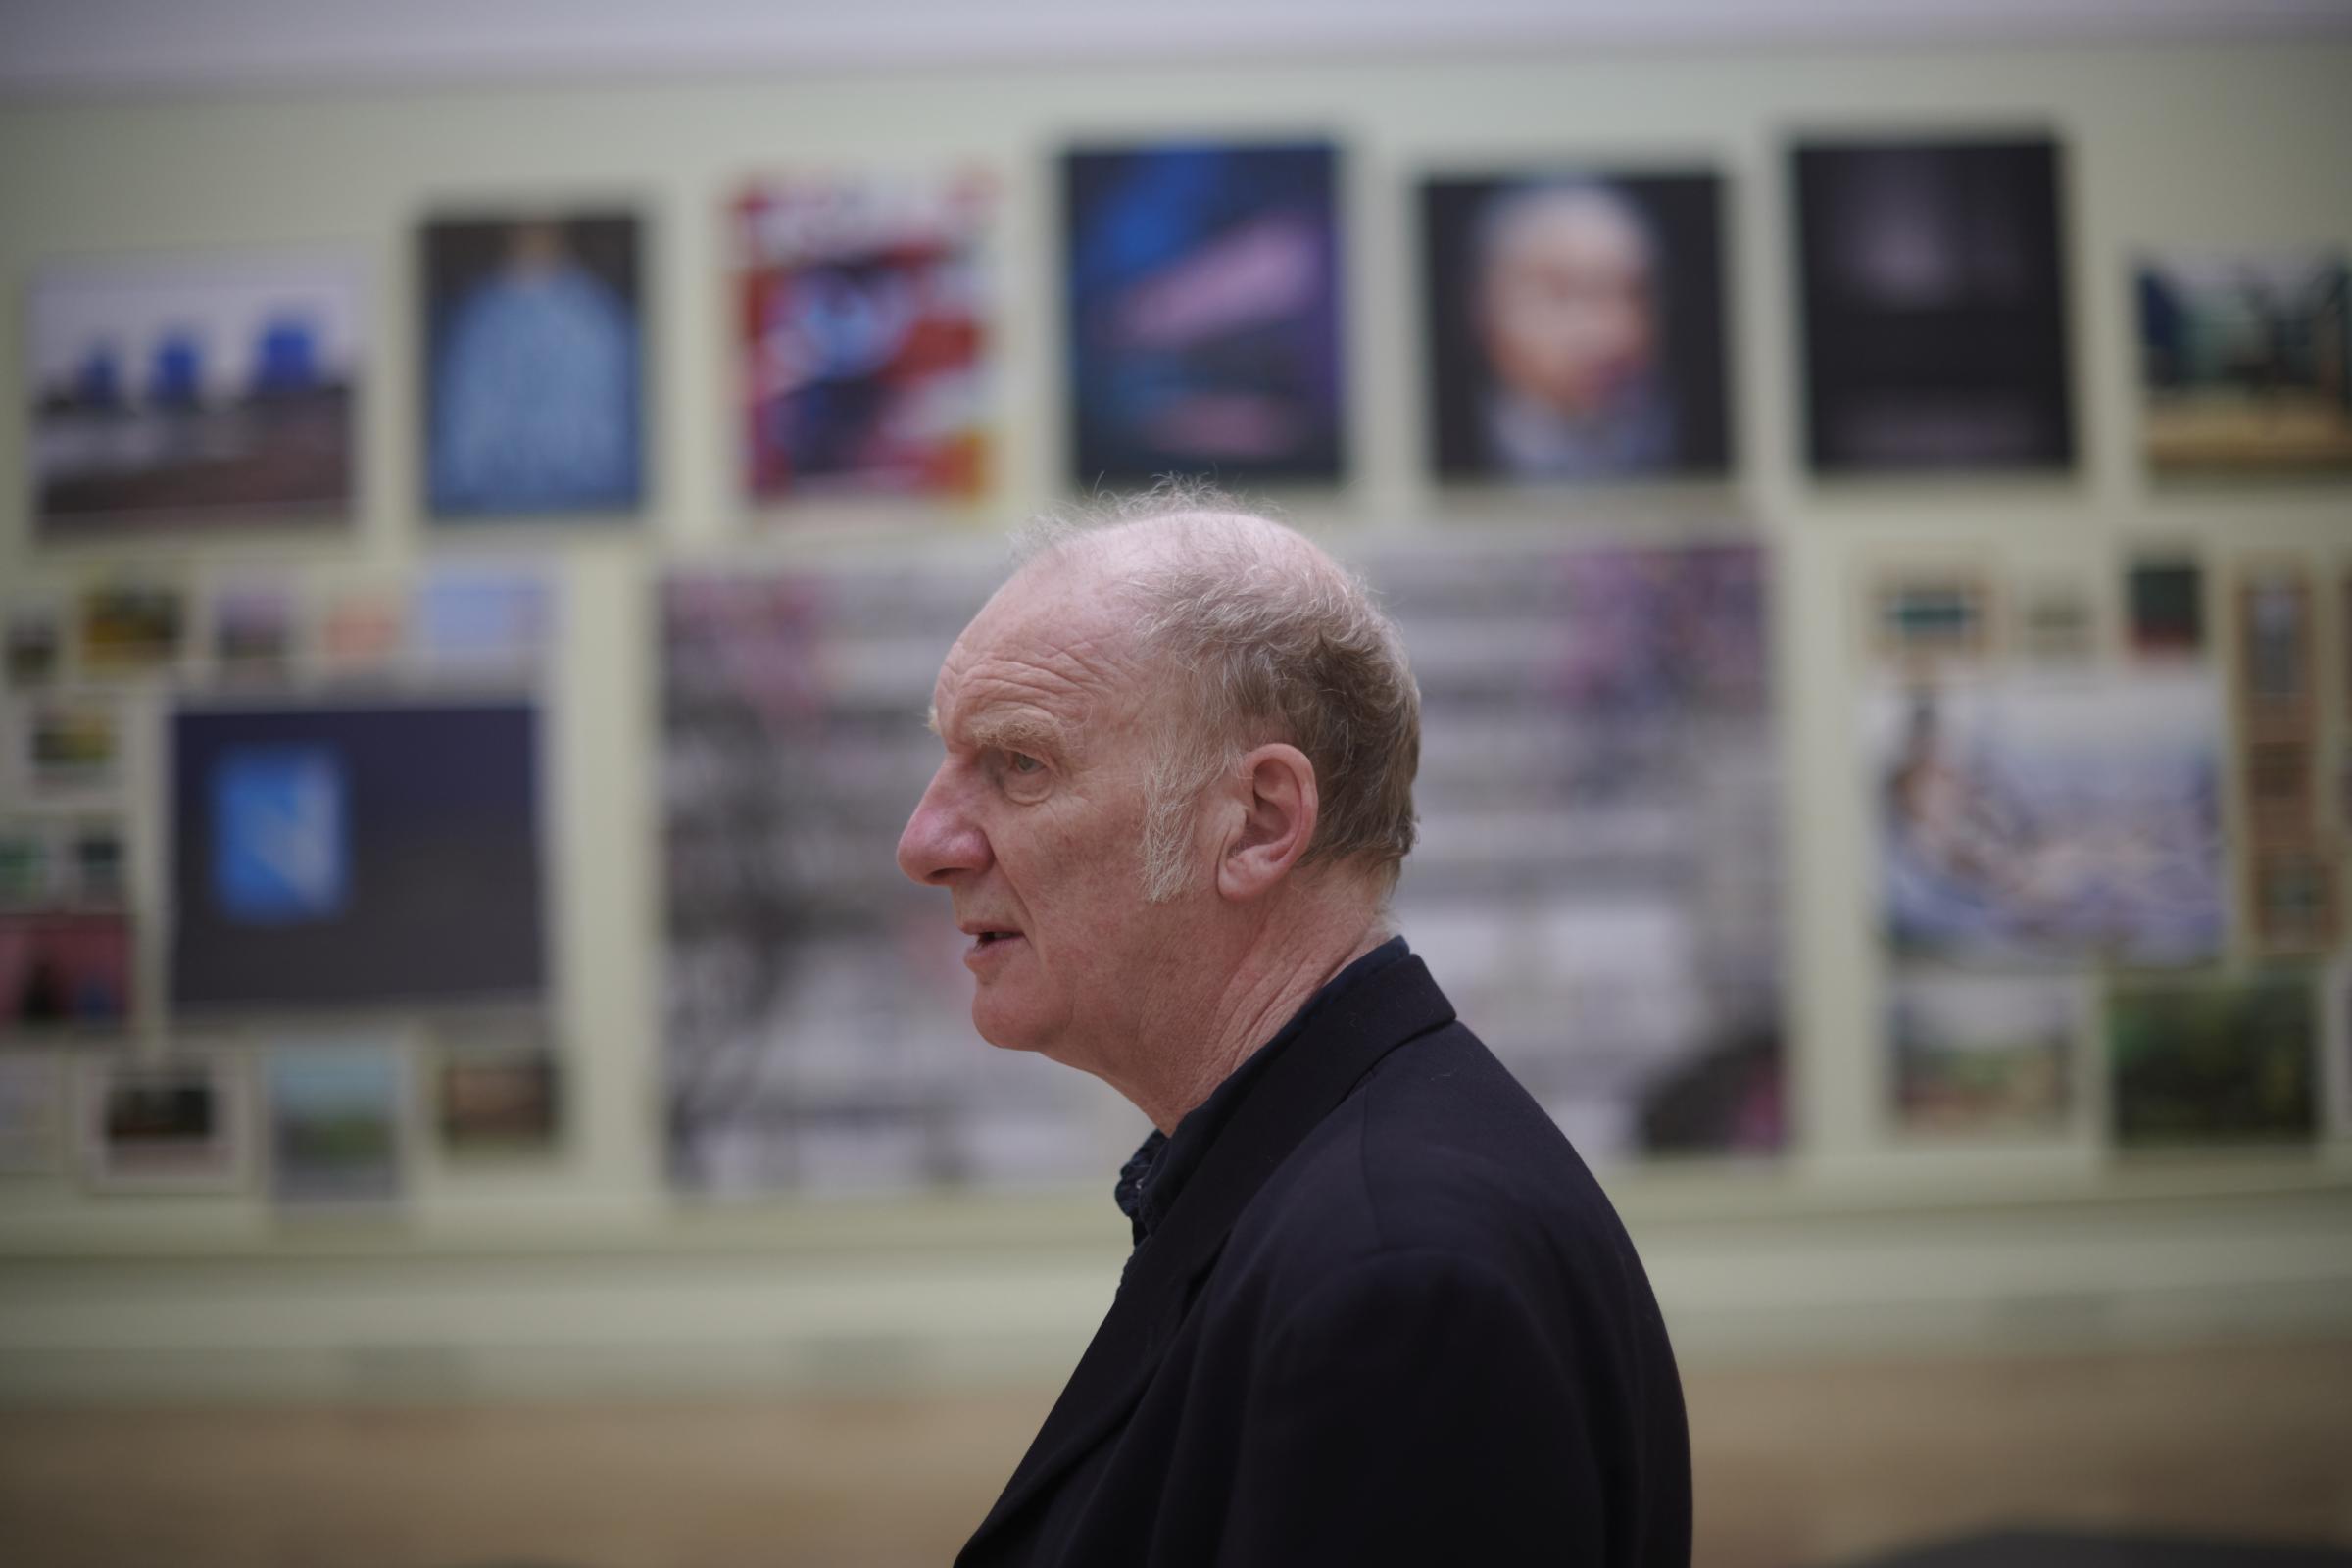 Artist Jock McFadyen on sex, violence and Scotland